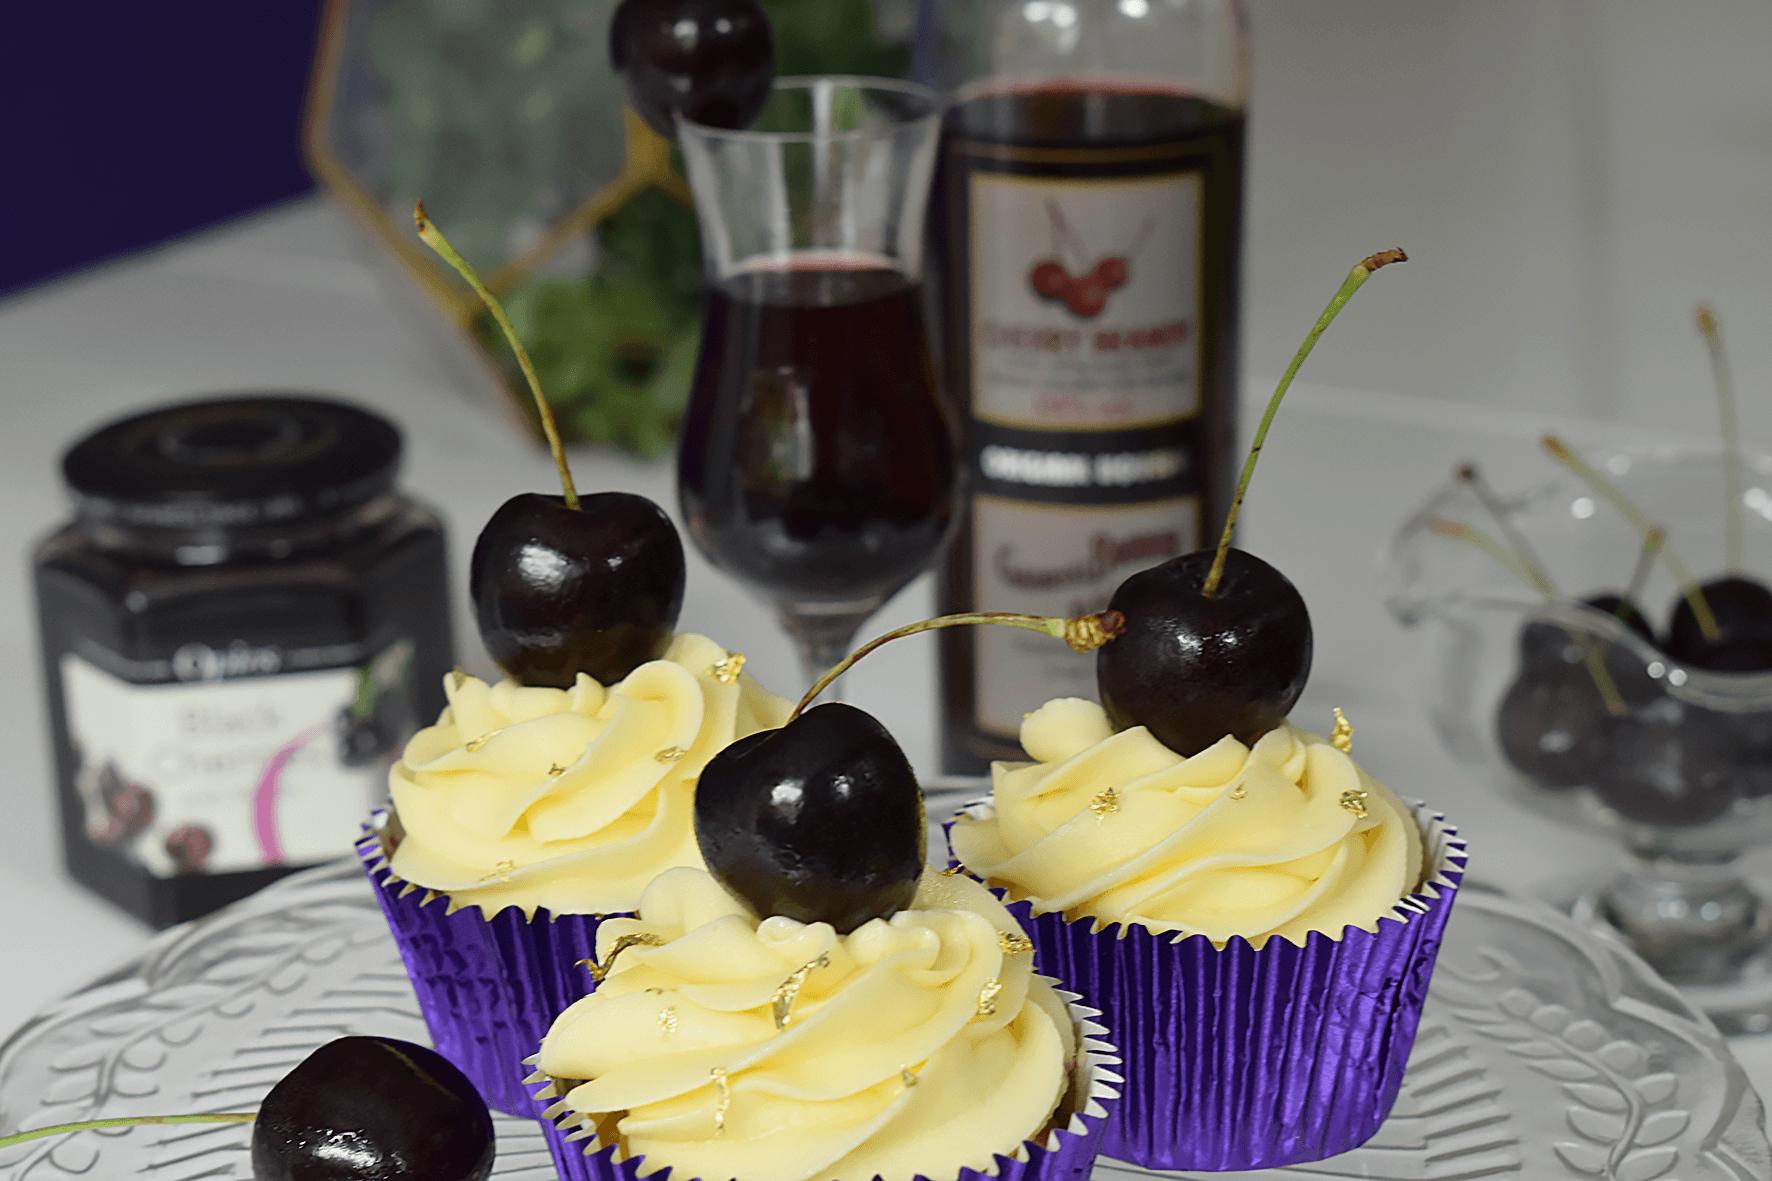 Cherry Brandy cocktail cupcakes